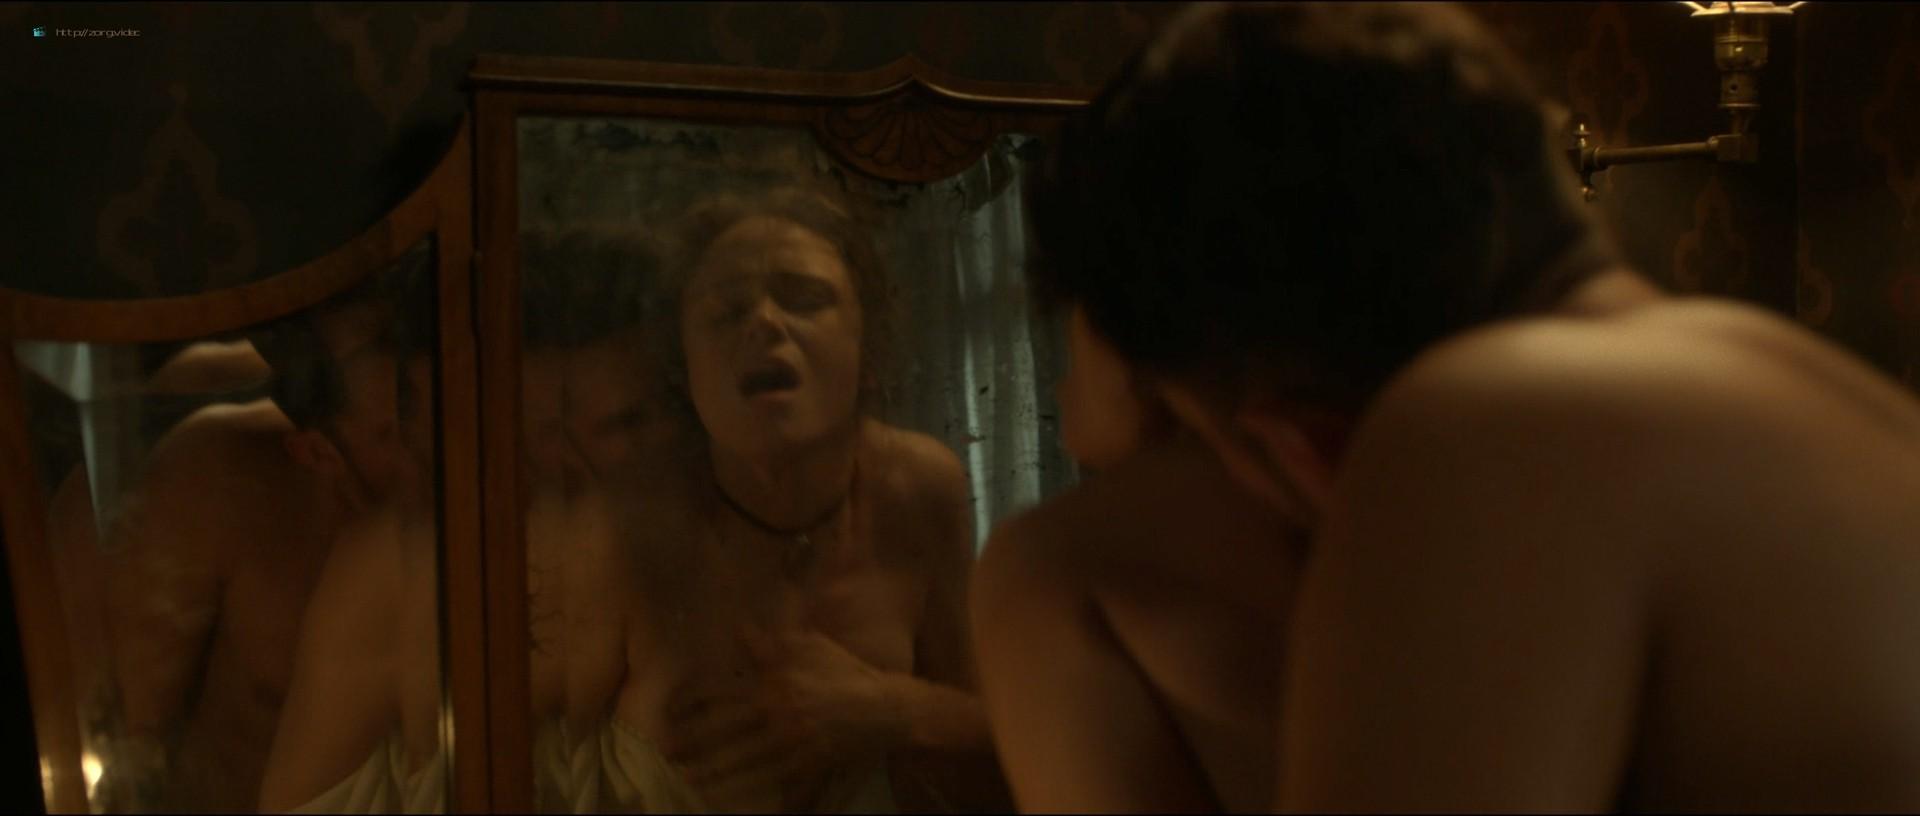 Maeve Dermody nude sex Karla Crome nude too - Carnival Row (2019) s1e1 HD 1080p (12)